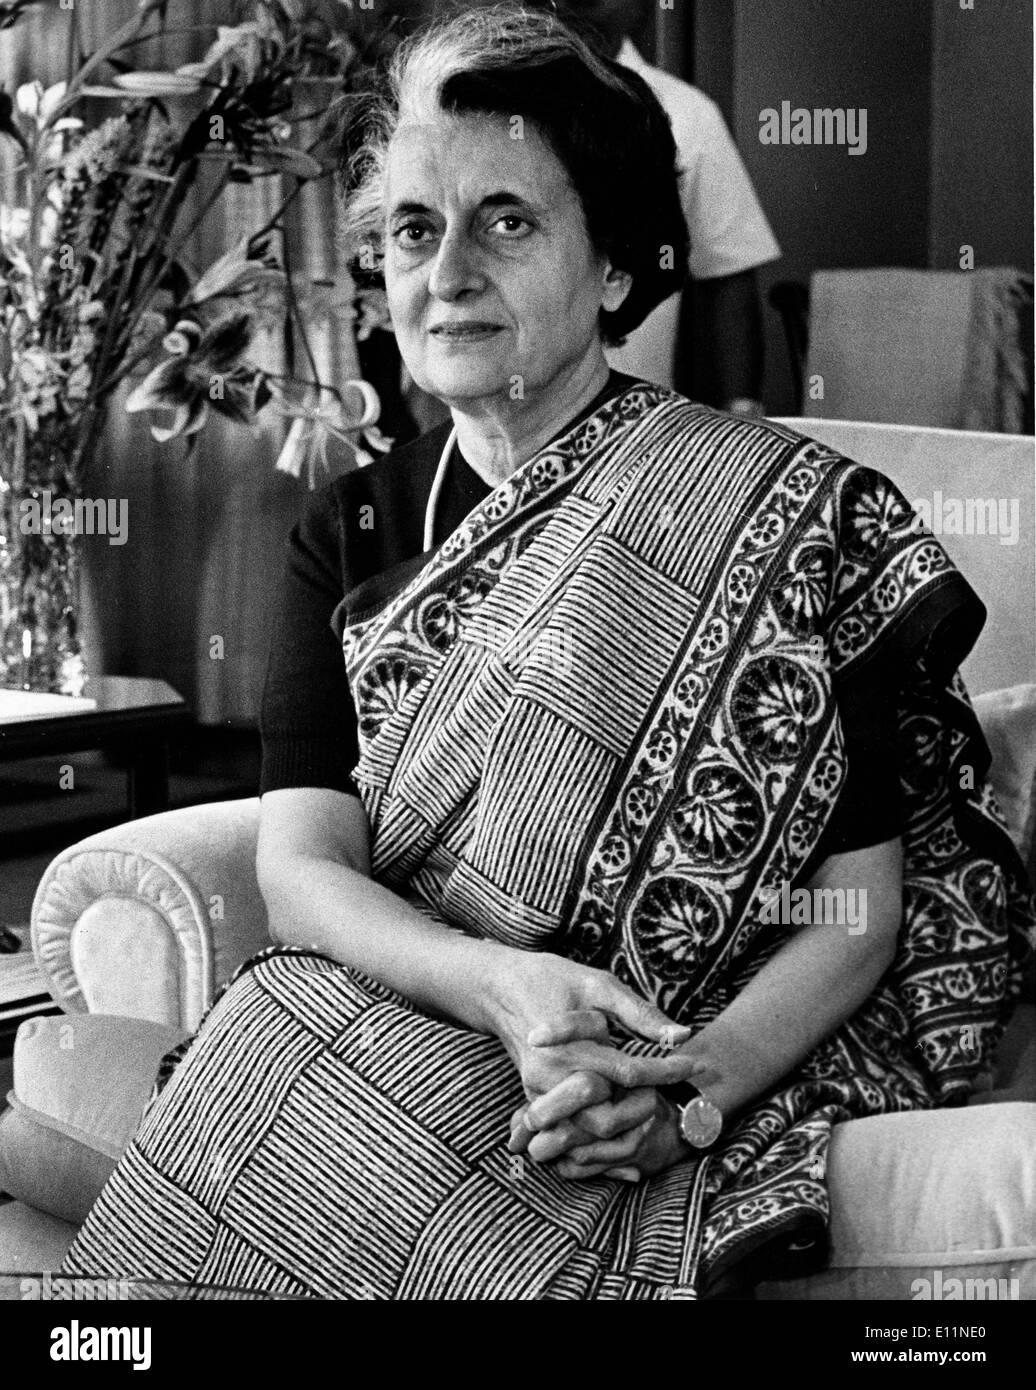 prime minister and gandhi The rajiv gandhi memorial: memorial of former prime minister of india rajiv gandhi - see 69 traveler reviews, 40 candid photos, and great deals for chennai, india, at tripadvisor.